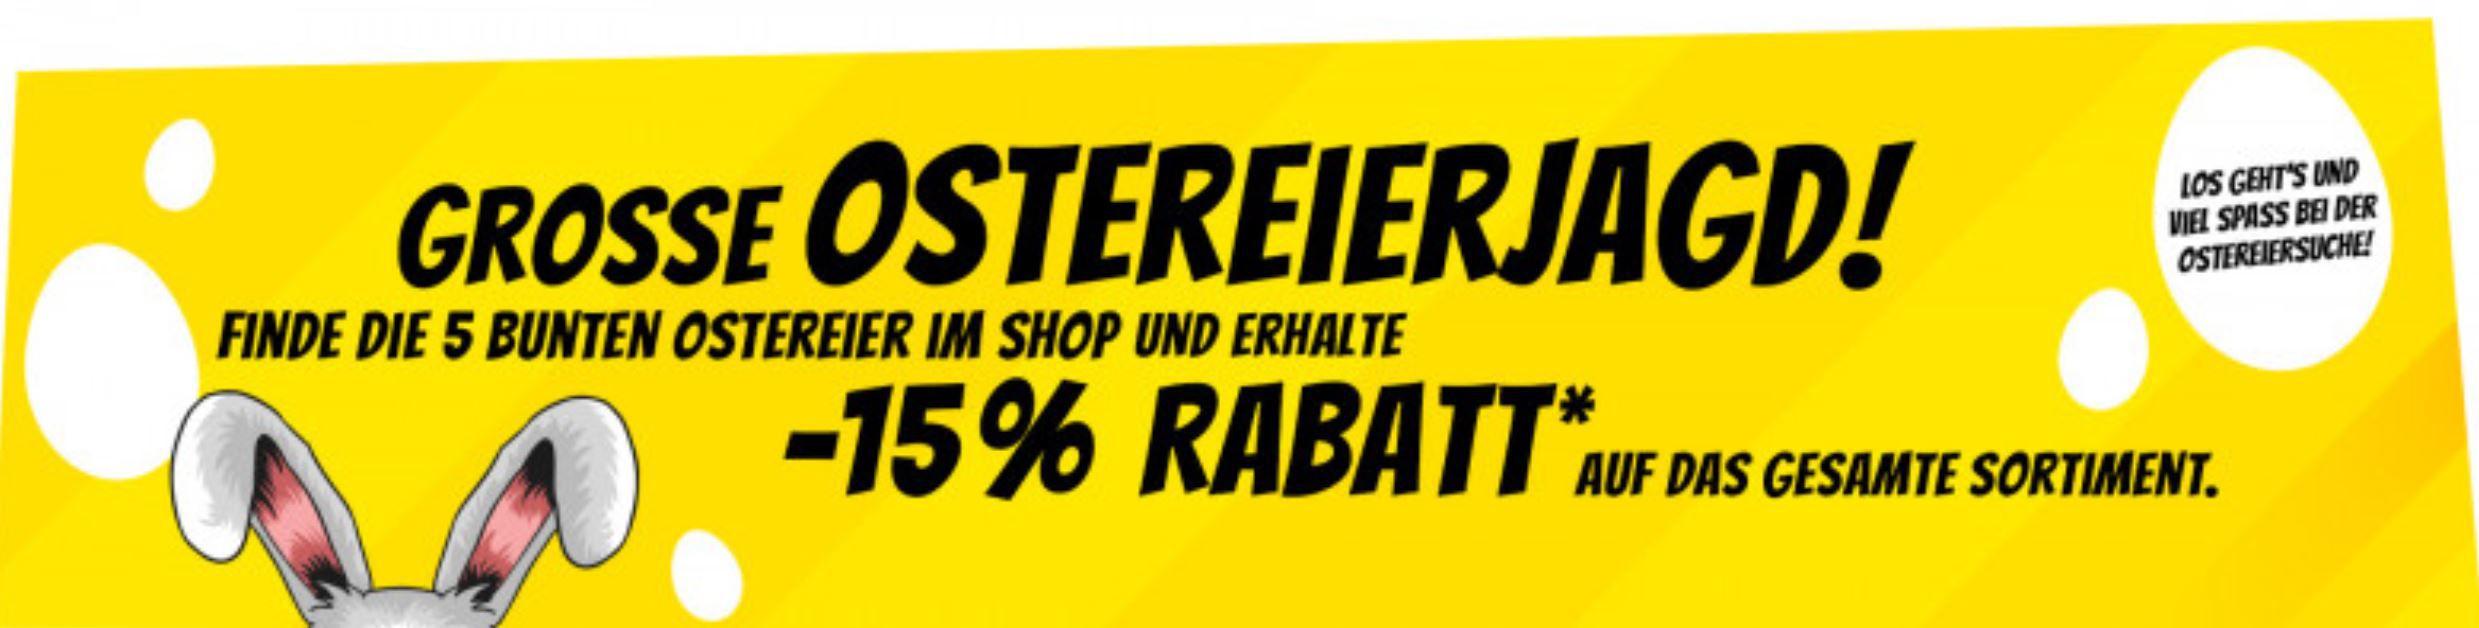 Endet heute: SportSpar Ostereier Jagd mit 15% Rabatt auf das komplette Sprtiment